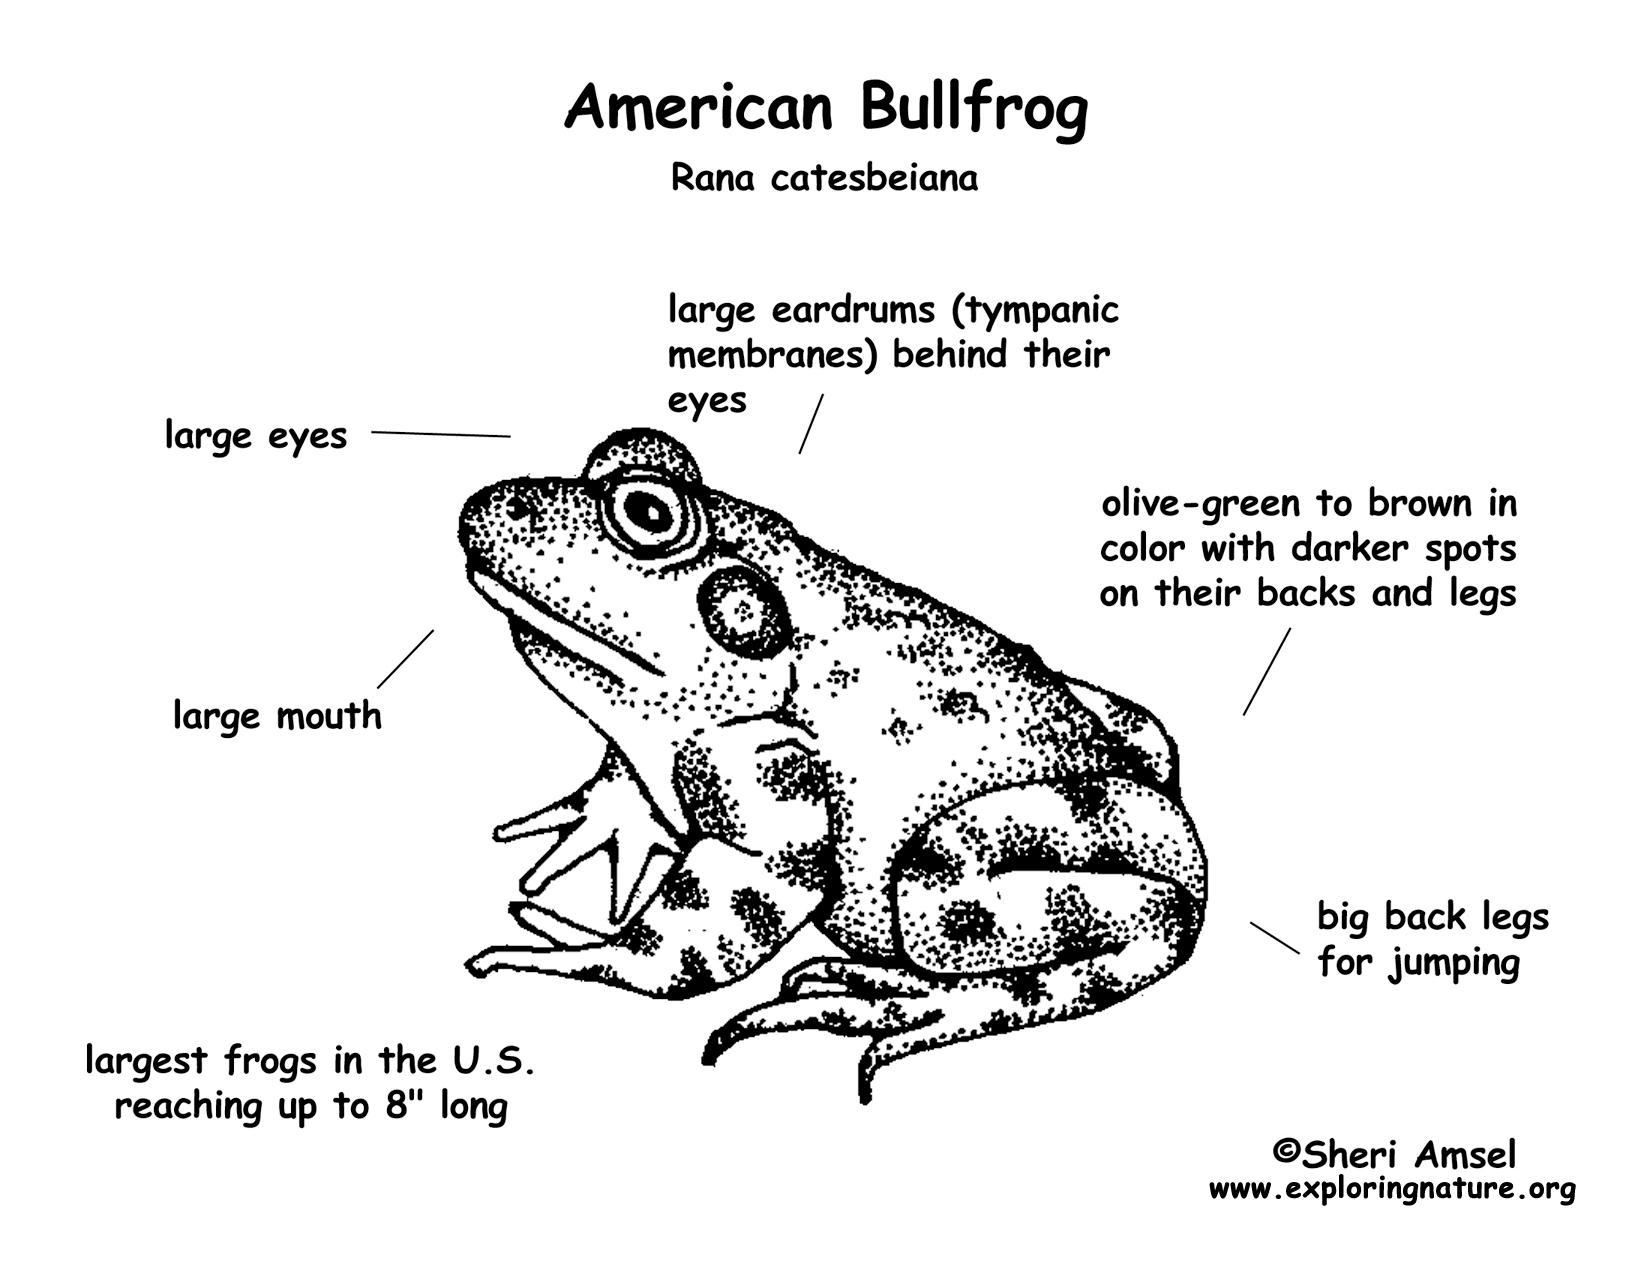 Frog Bullfrog